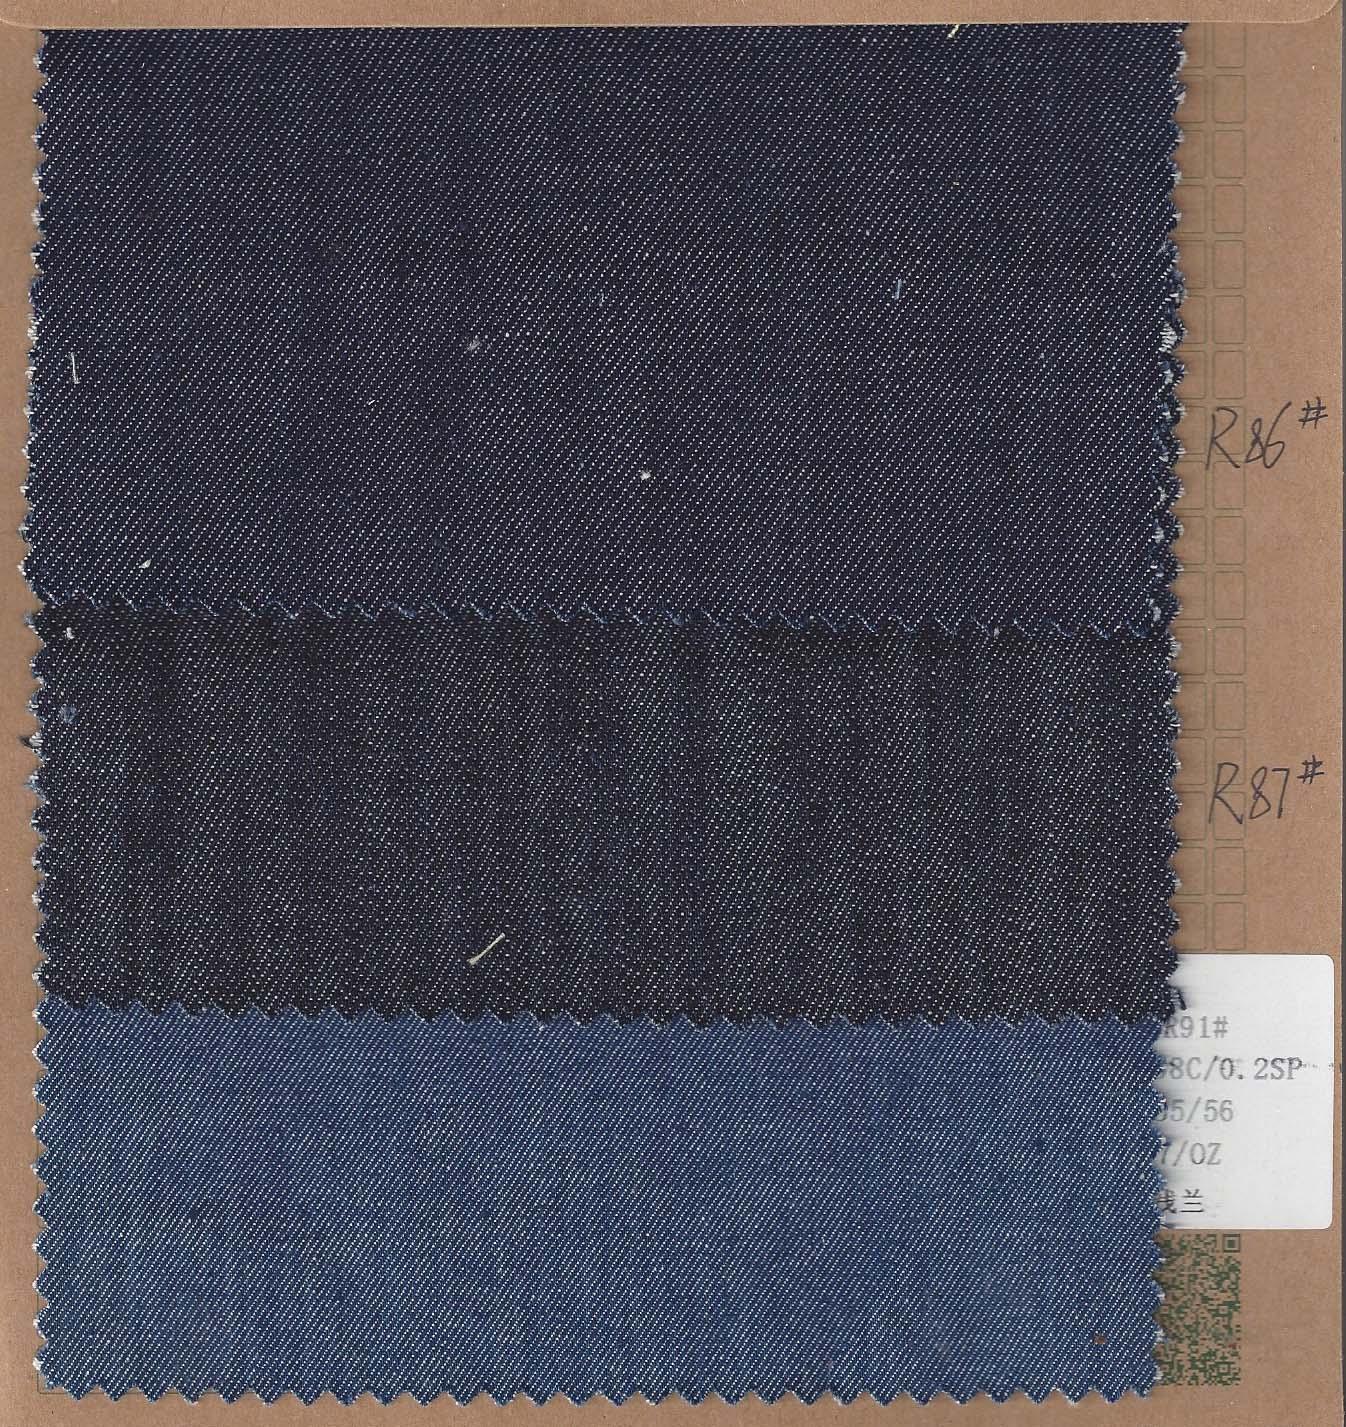 Jing Yang Textile R86.jpg